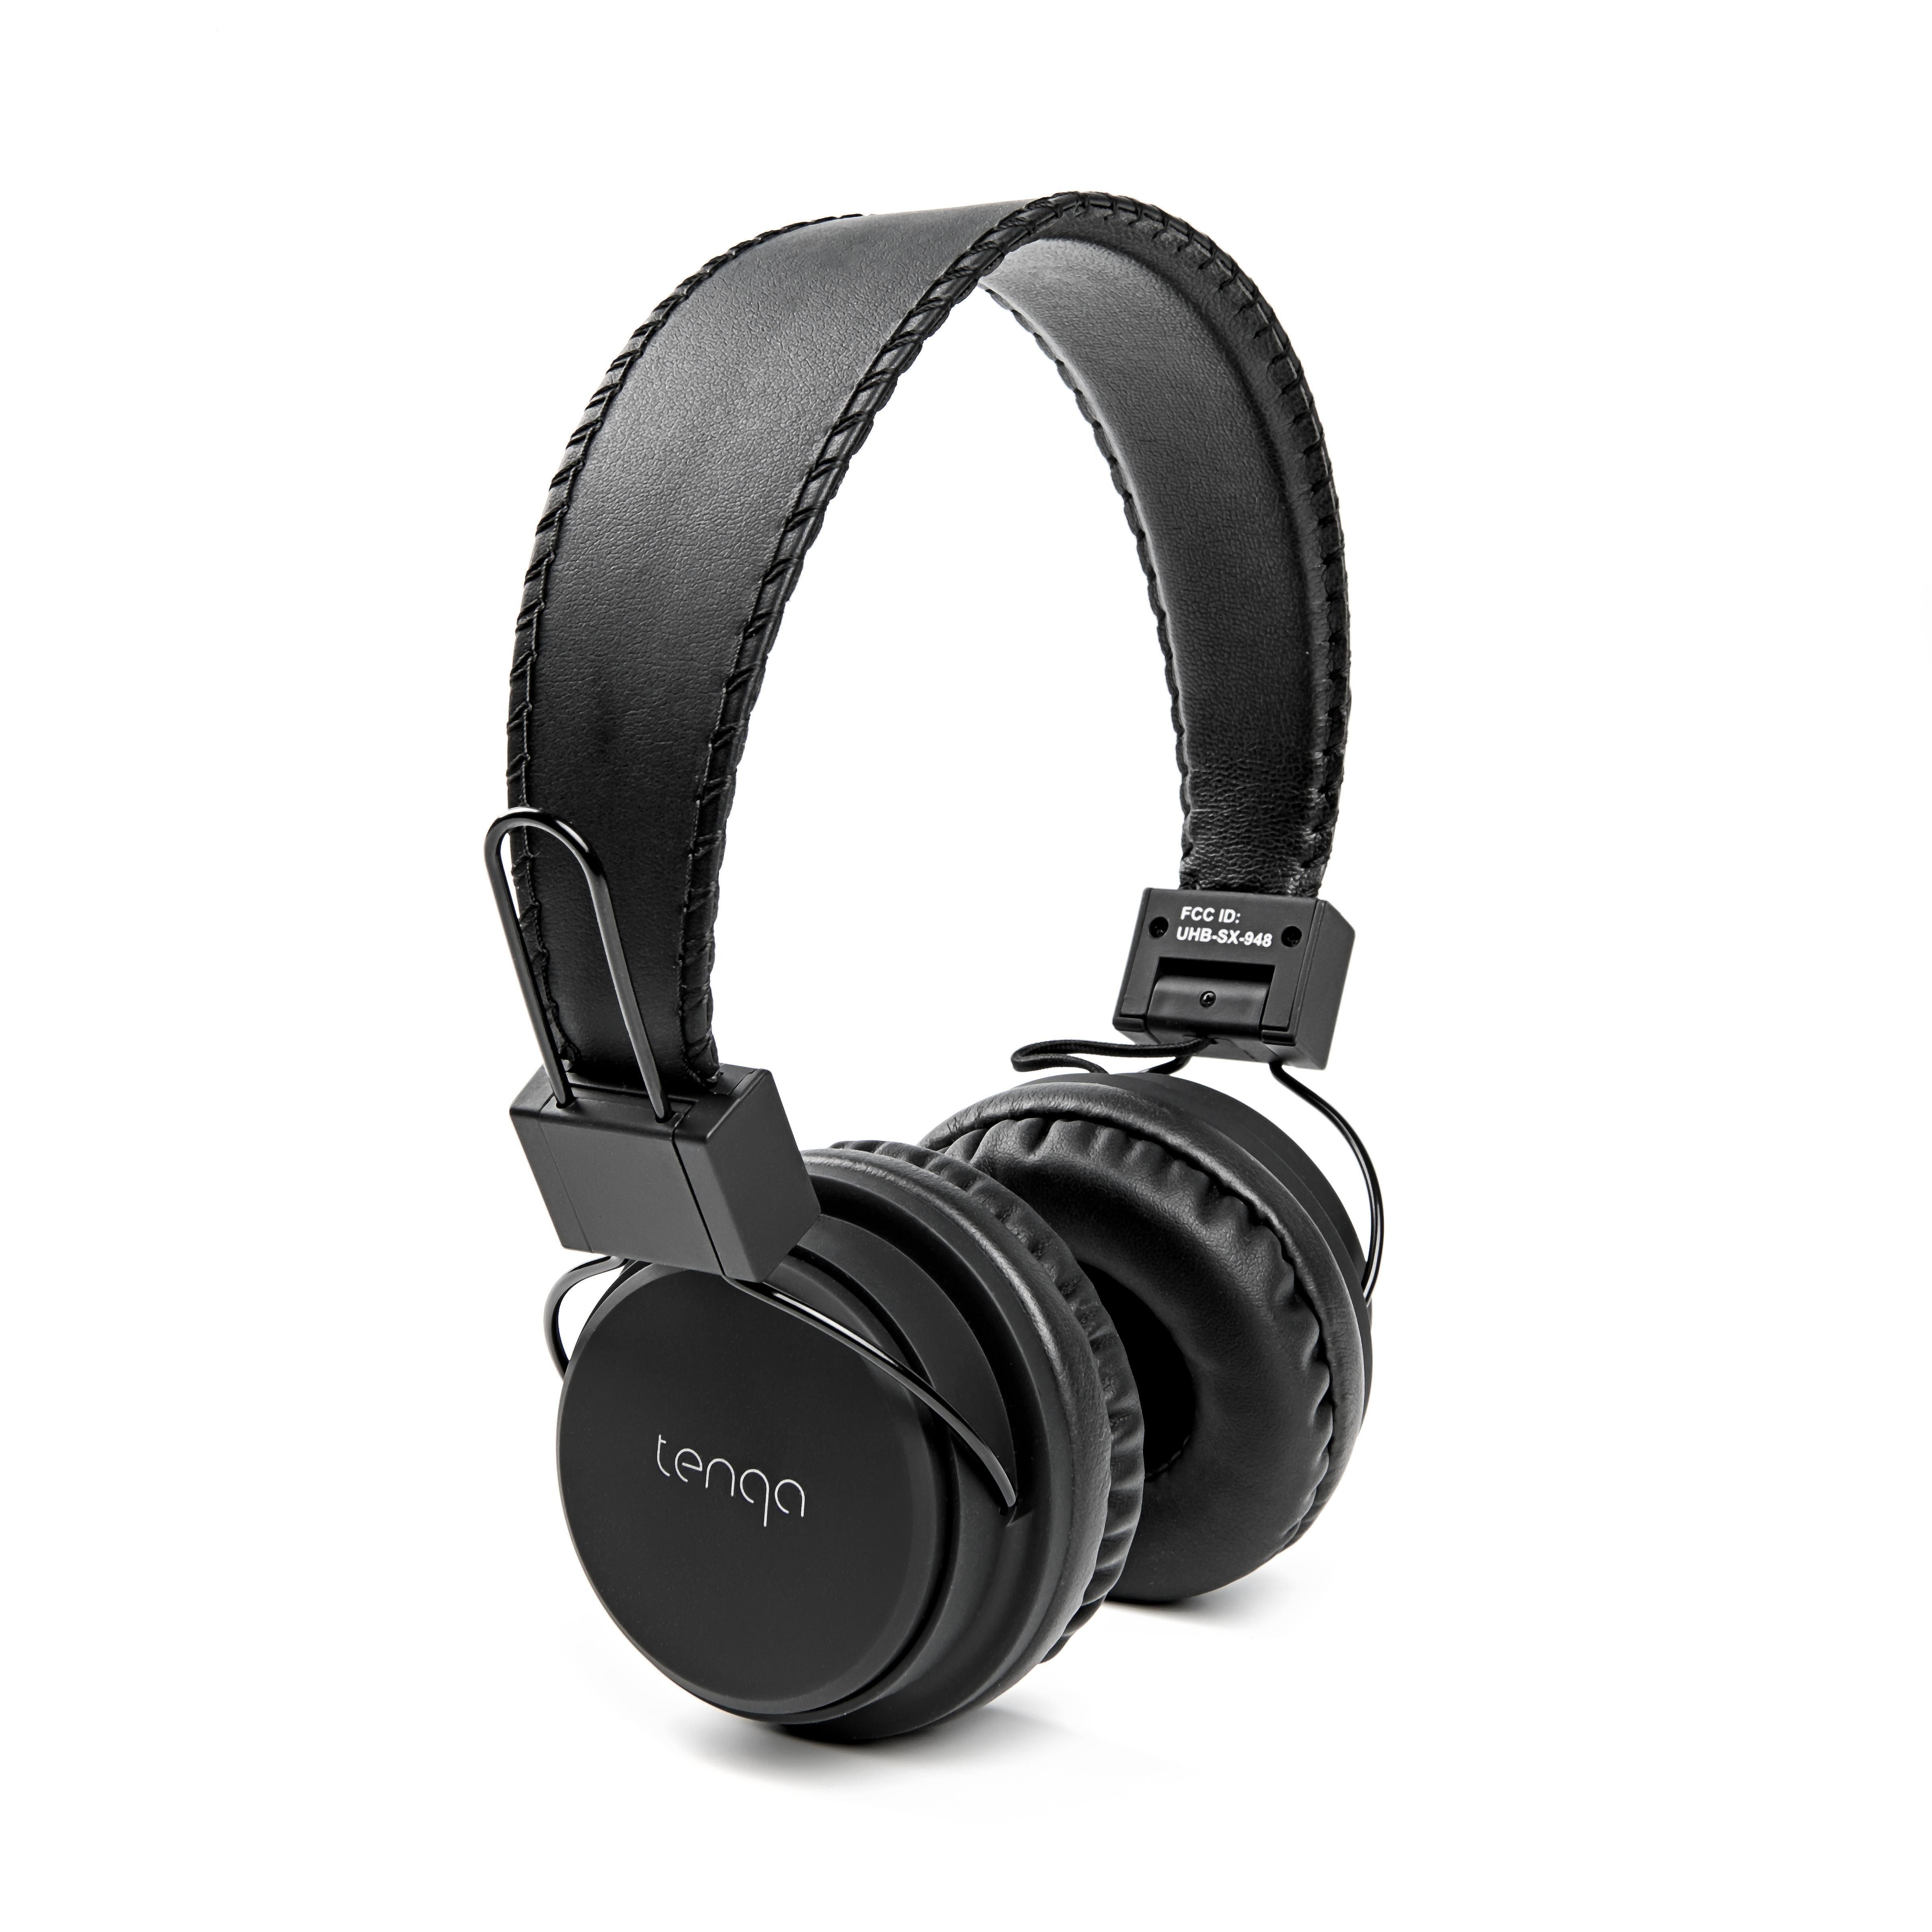 tenqa remxd wht wireless bluetooth headphones white home audio theater. Black Bedroom Furniture Sets. Home Design Ideas